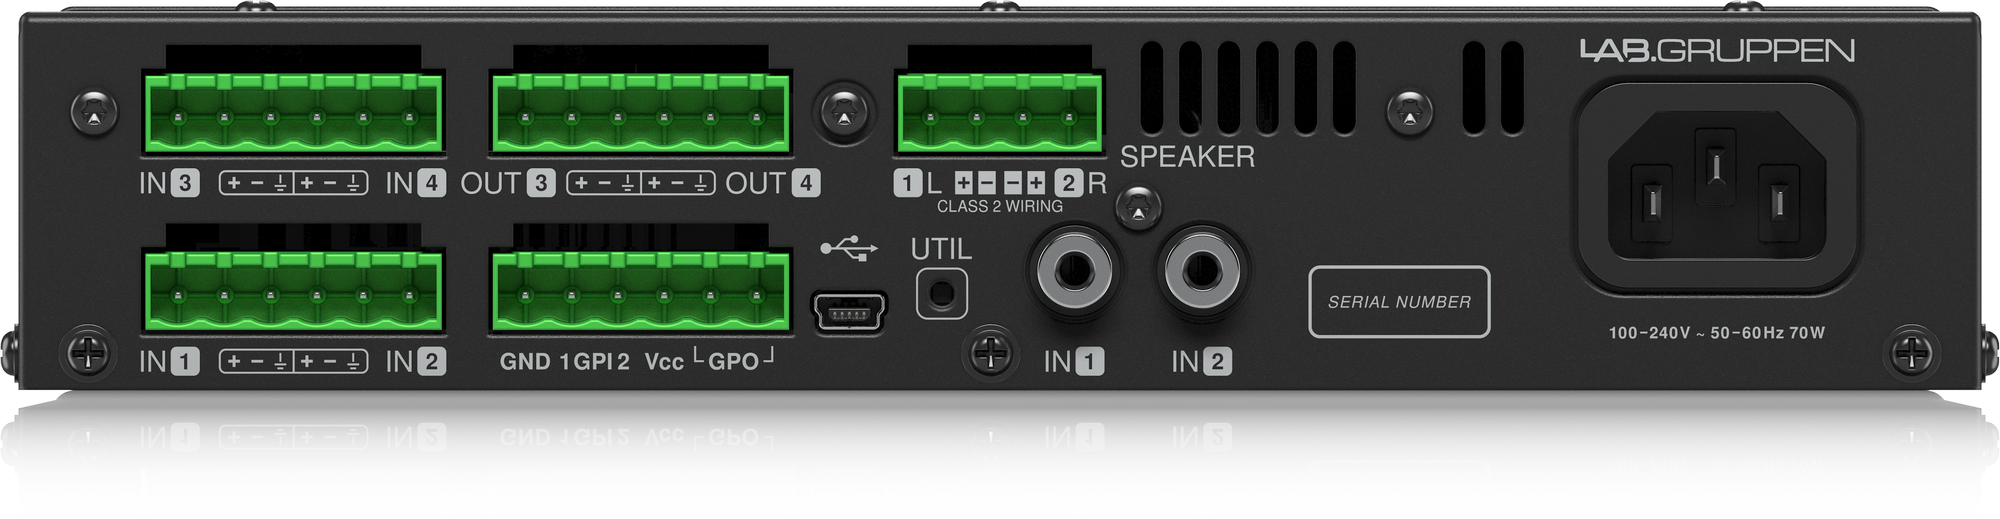 Lab Gruppen Lab. Gruppen LUCIA 240 / 2M Compact matrix amplifier